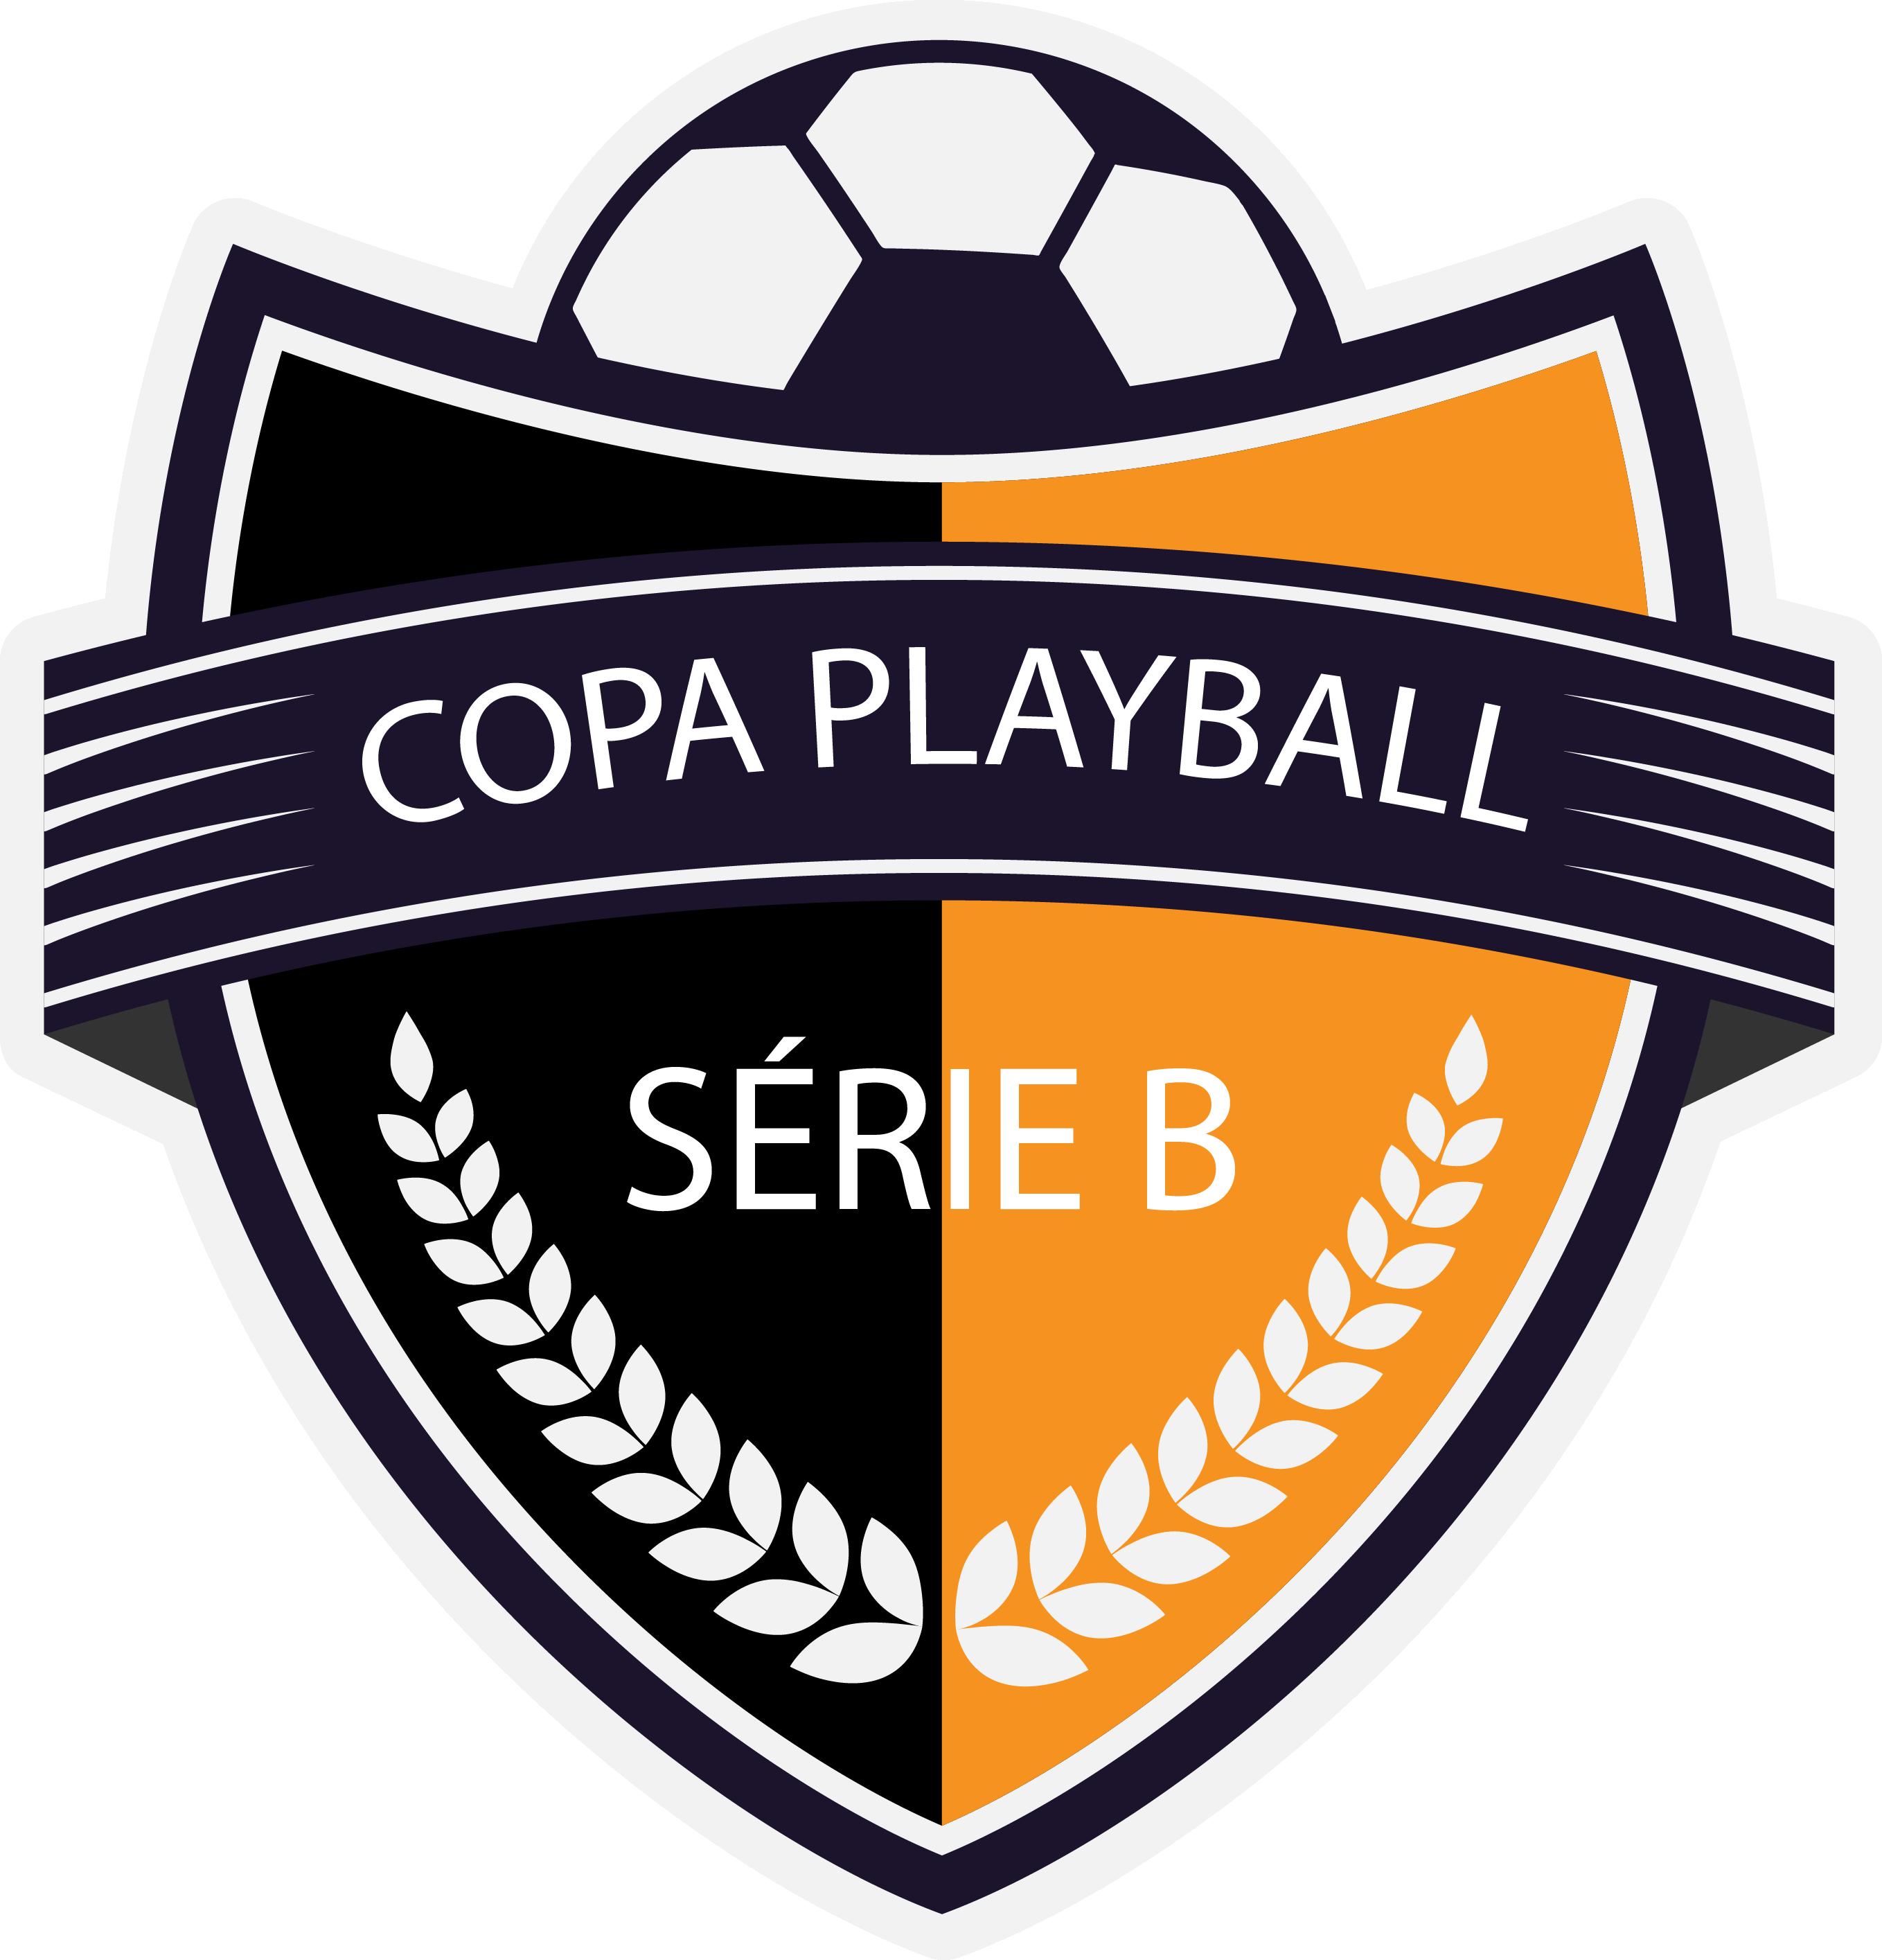 XII Copa Playball: Série B